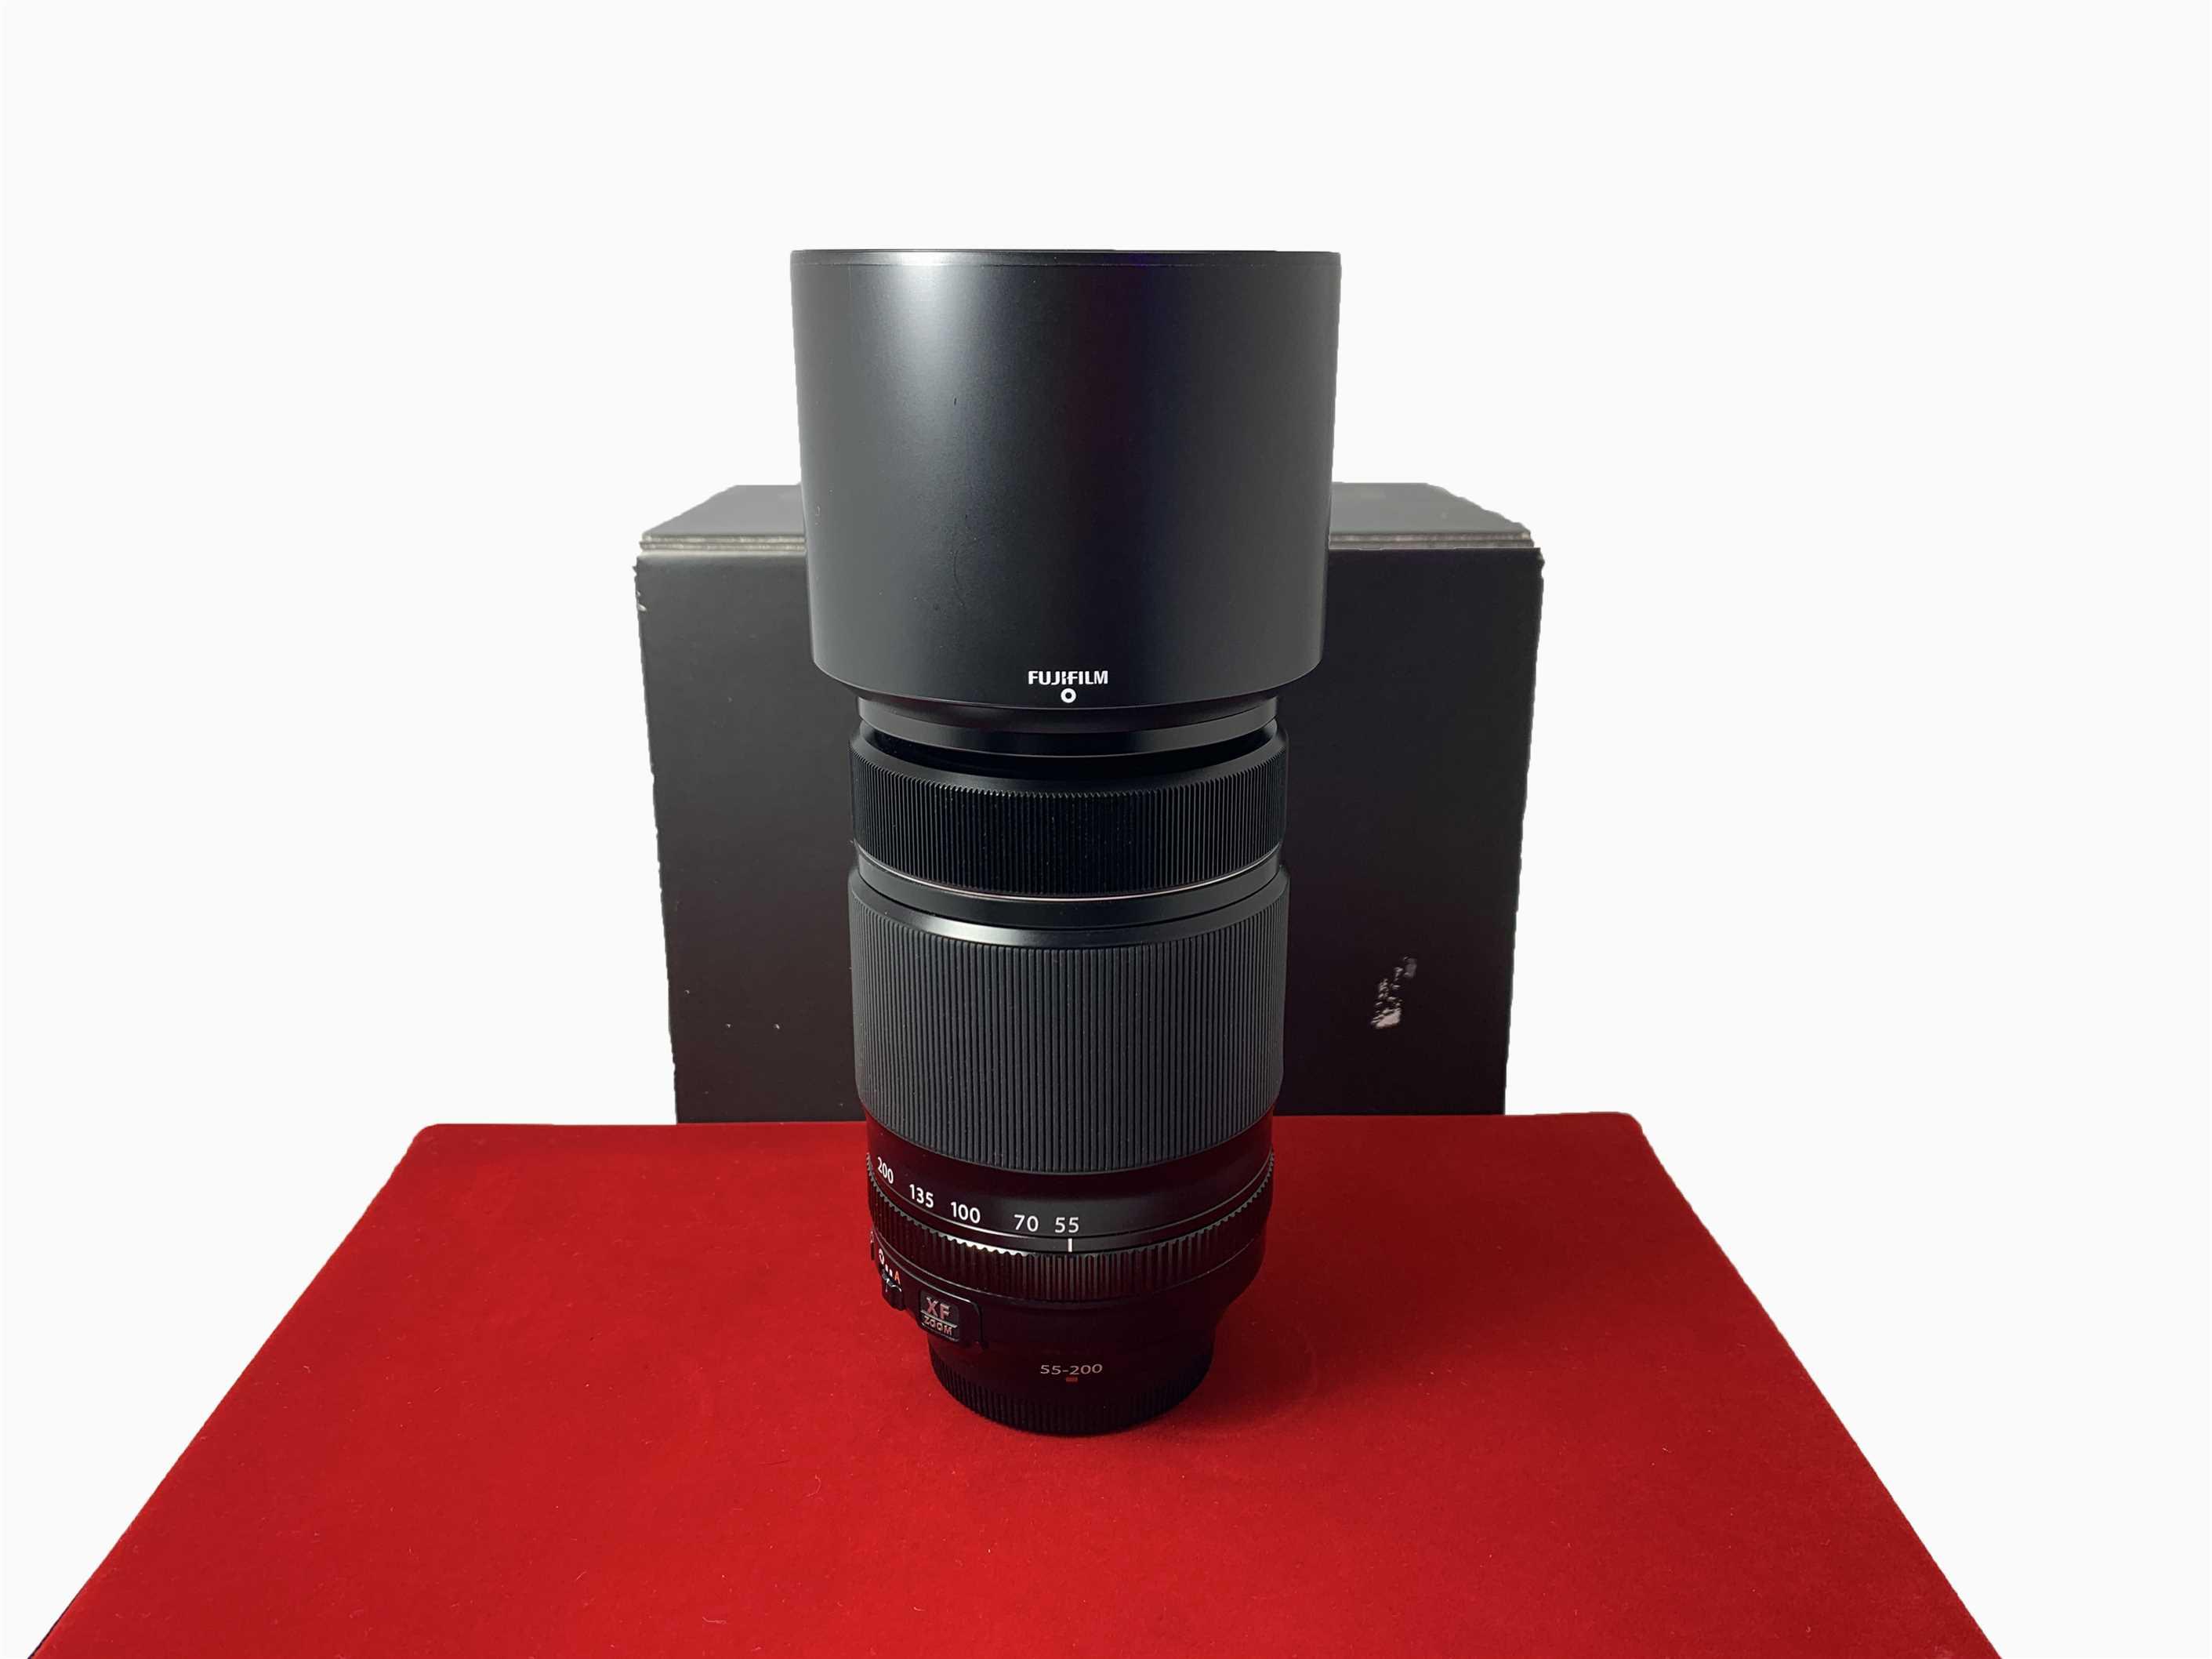 [USED-PJ33] Fujifilm 55-200mm F3.5-4.8 R LM OIS XF Lens,95% Like New Condition (S/N:38A00954)